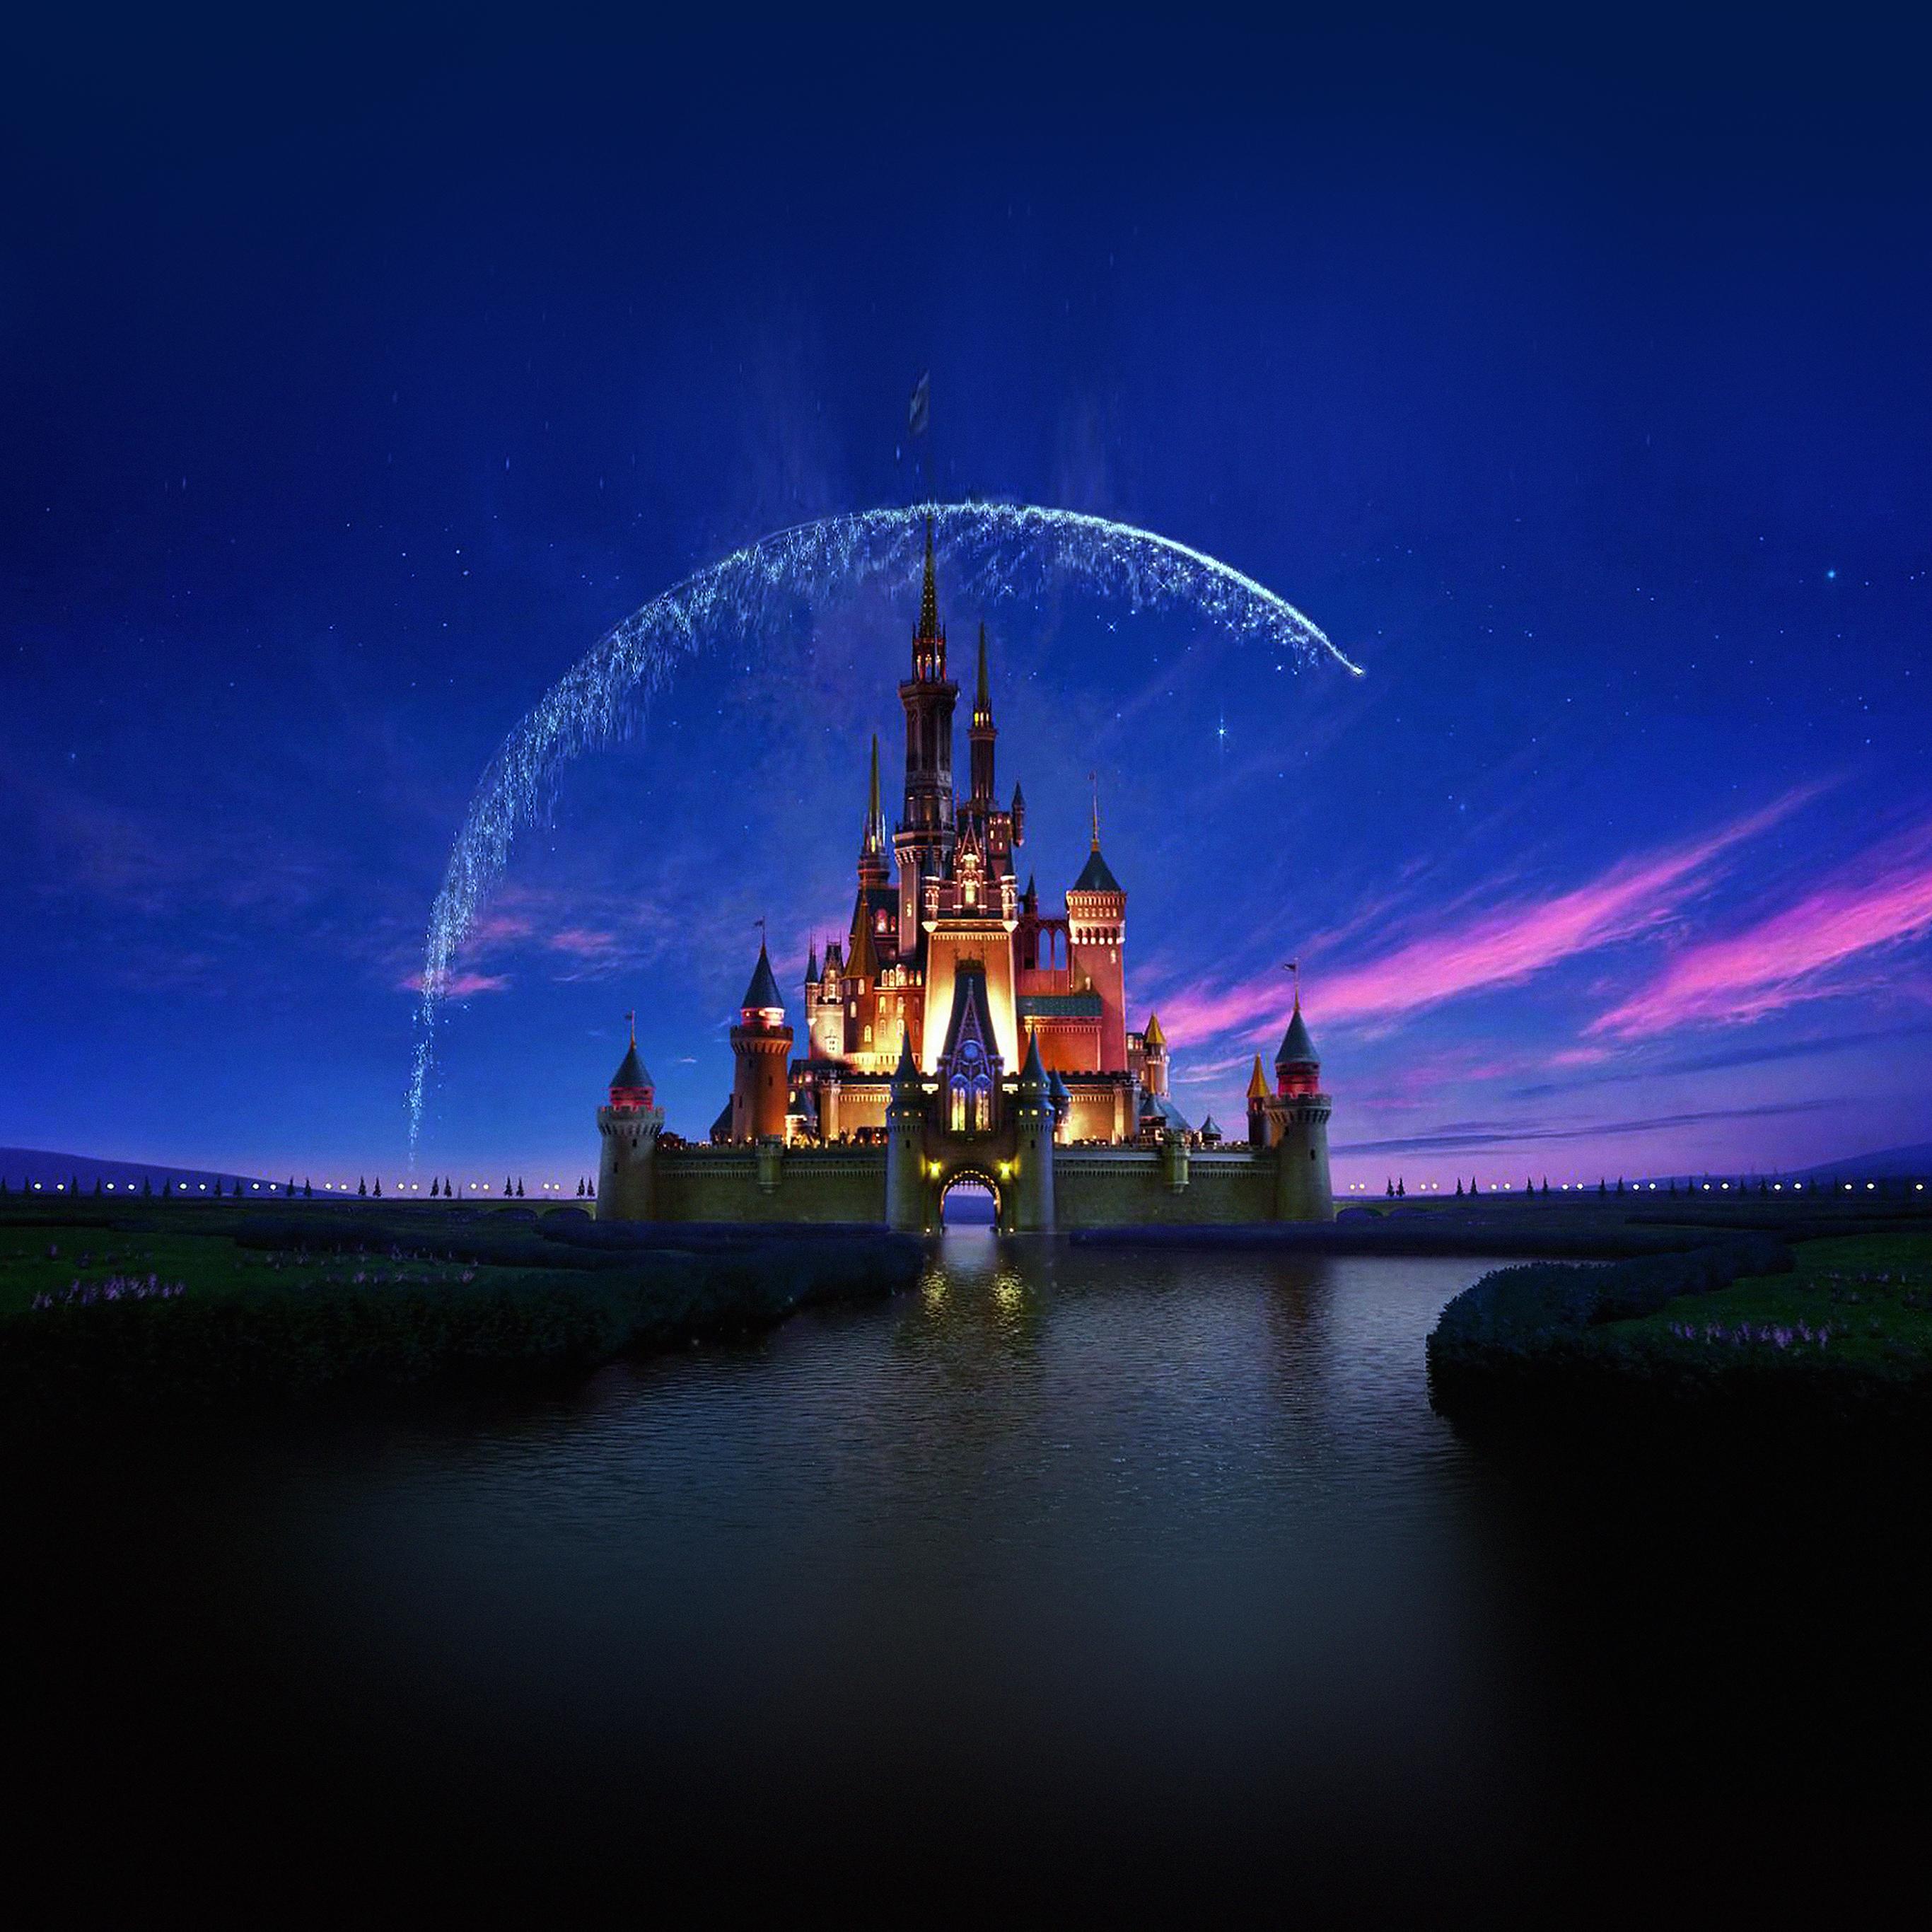 Amazing Wallpaper Macbook Disneyland - papers  Image_216772.jpg